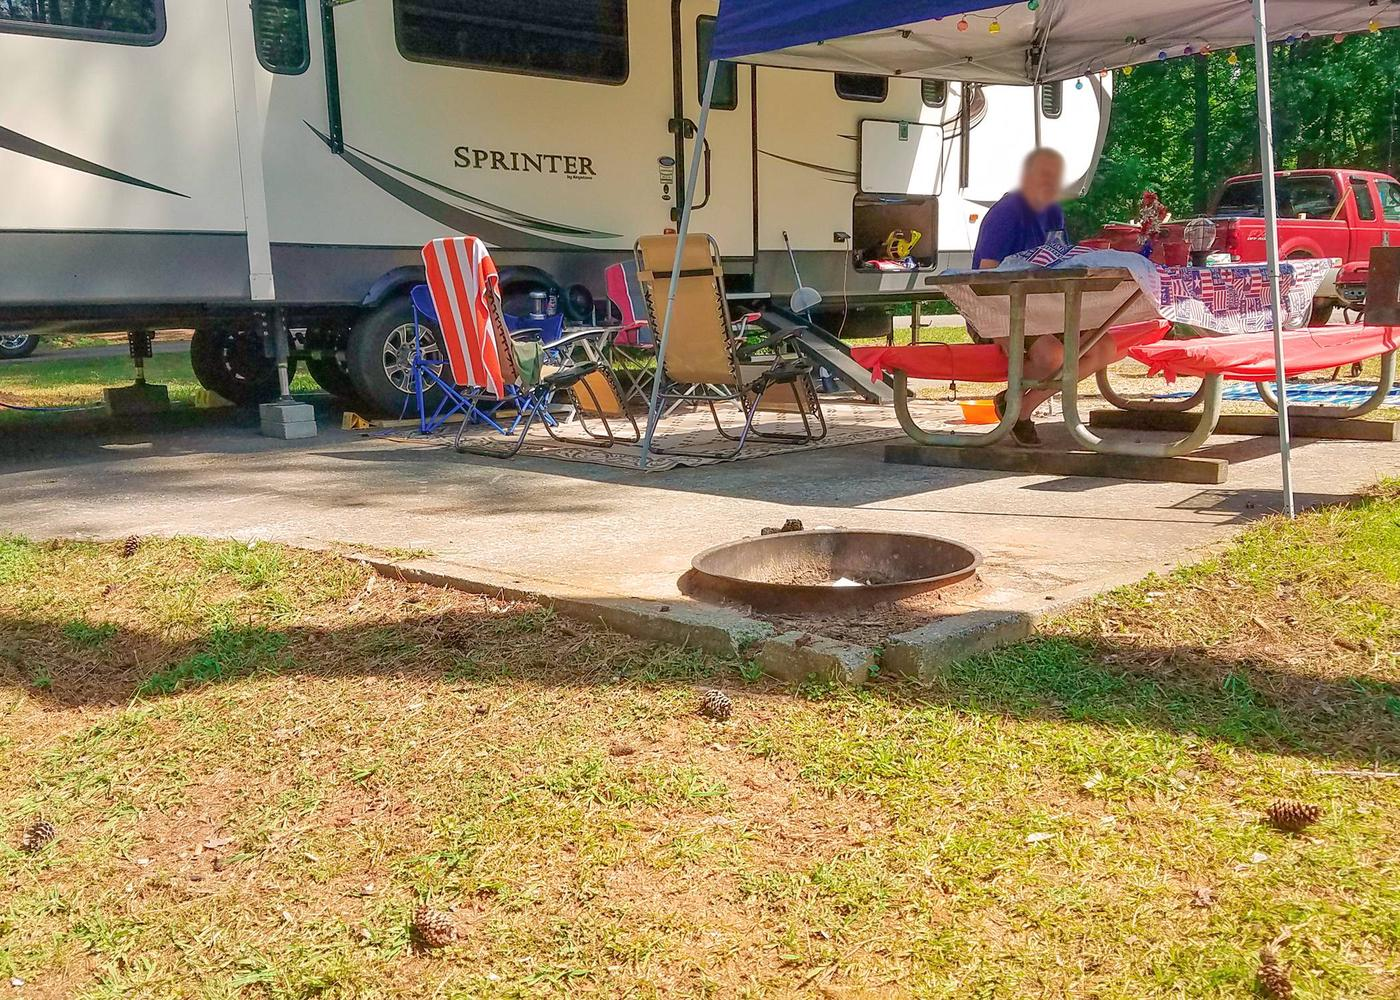 Campsite view.Victoria Campground, campsite 29.